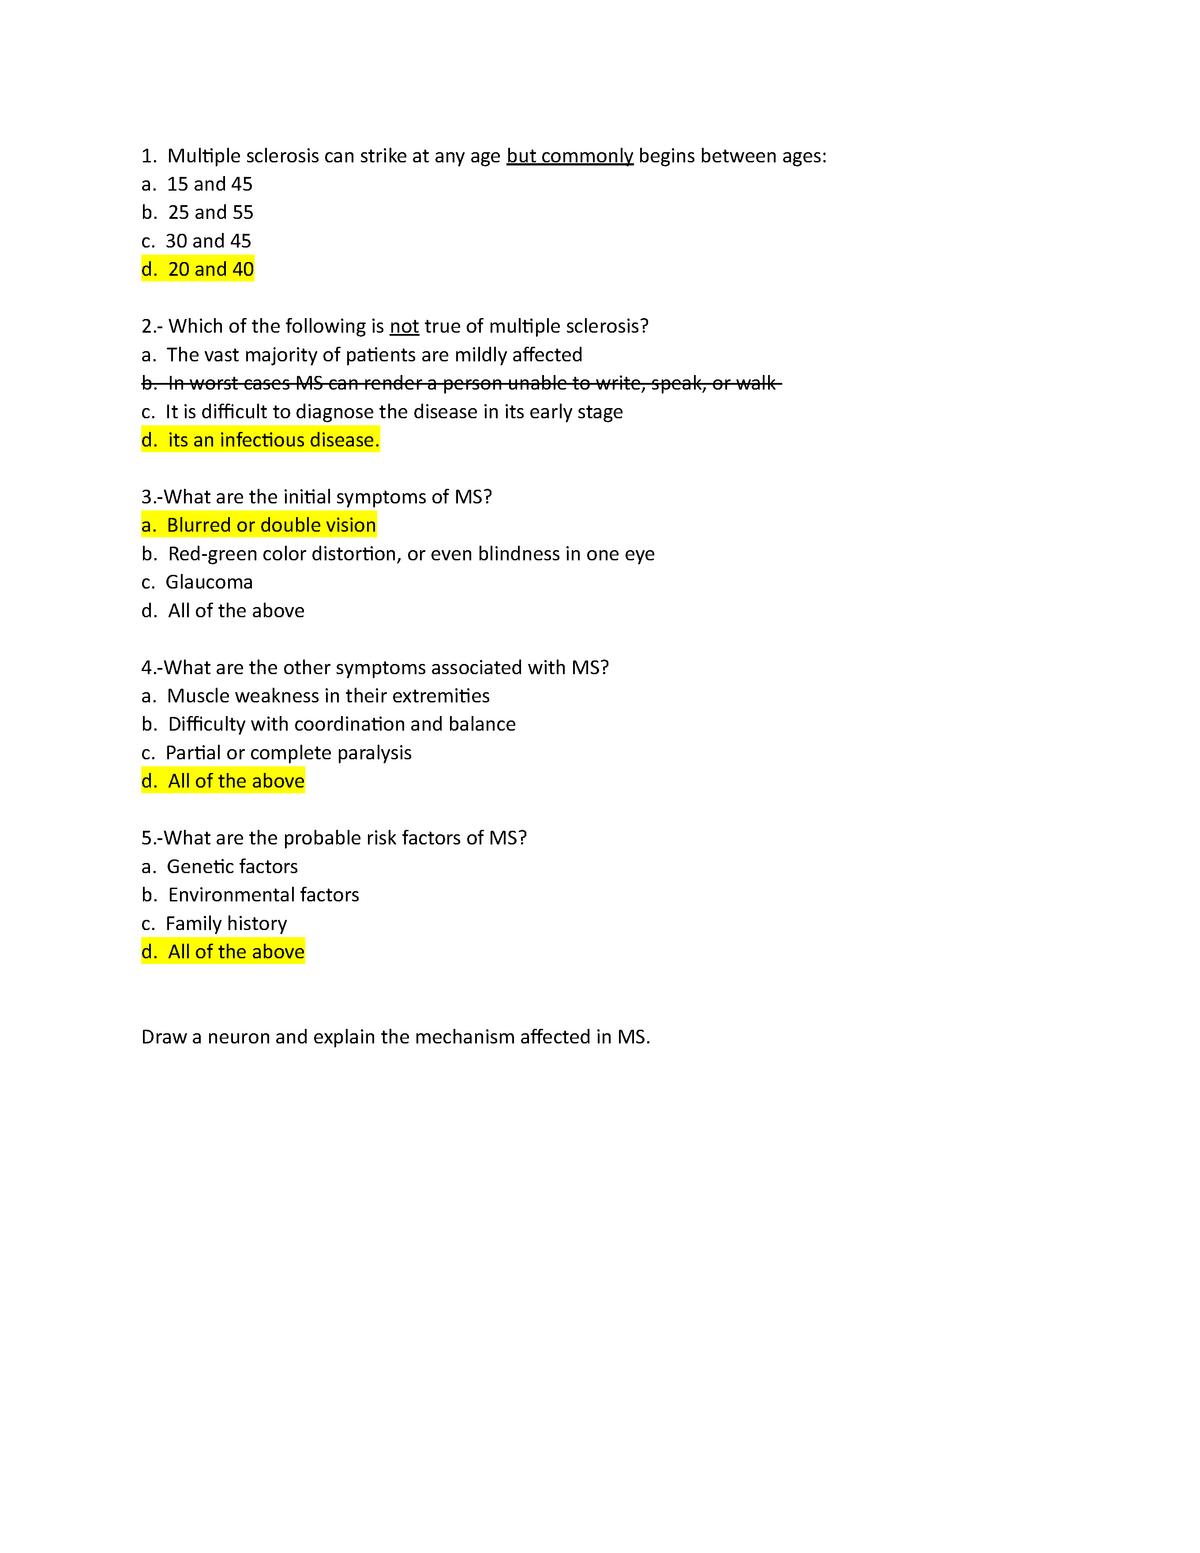 Multiple Sclerosis Quiz - BMED1108 - StuDocu